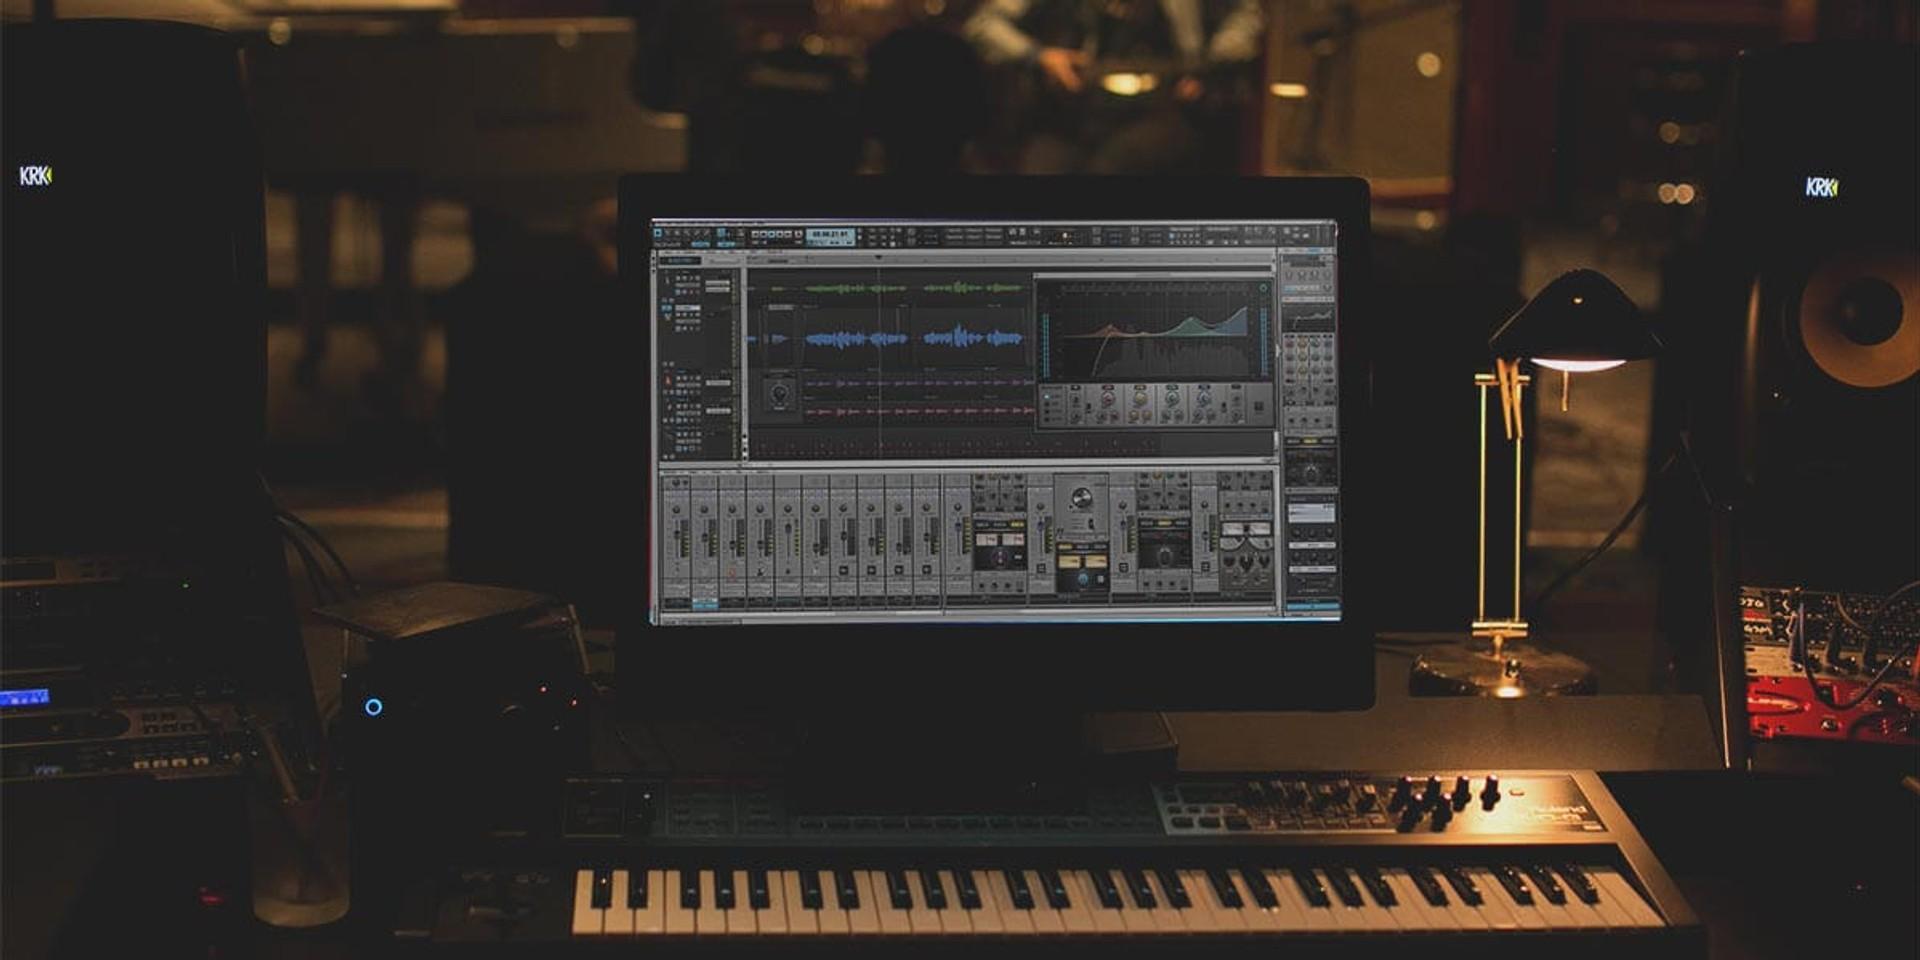 BandLab buys Cakewalk, creators of classic Sonar audio software, from Gibson